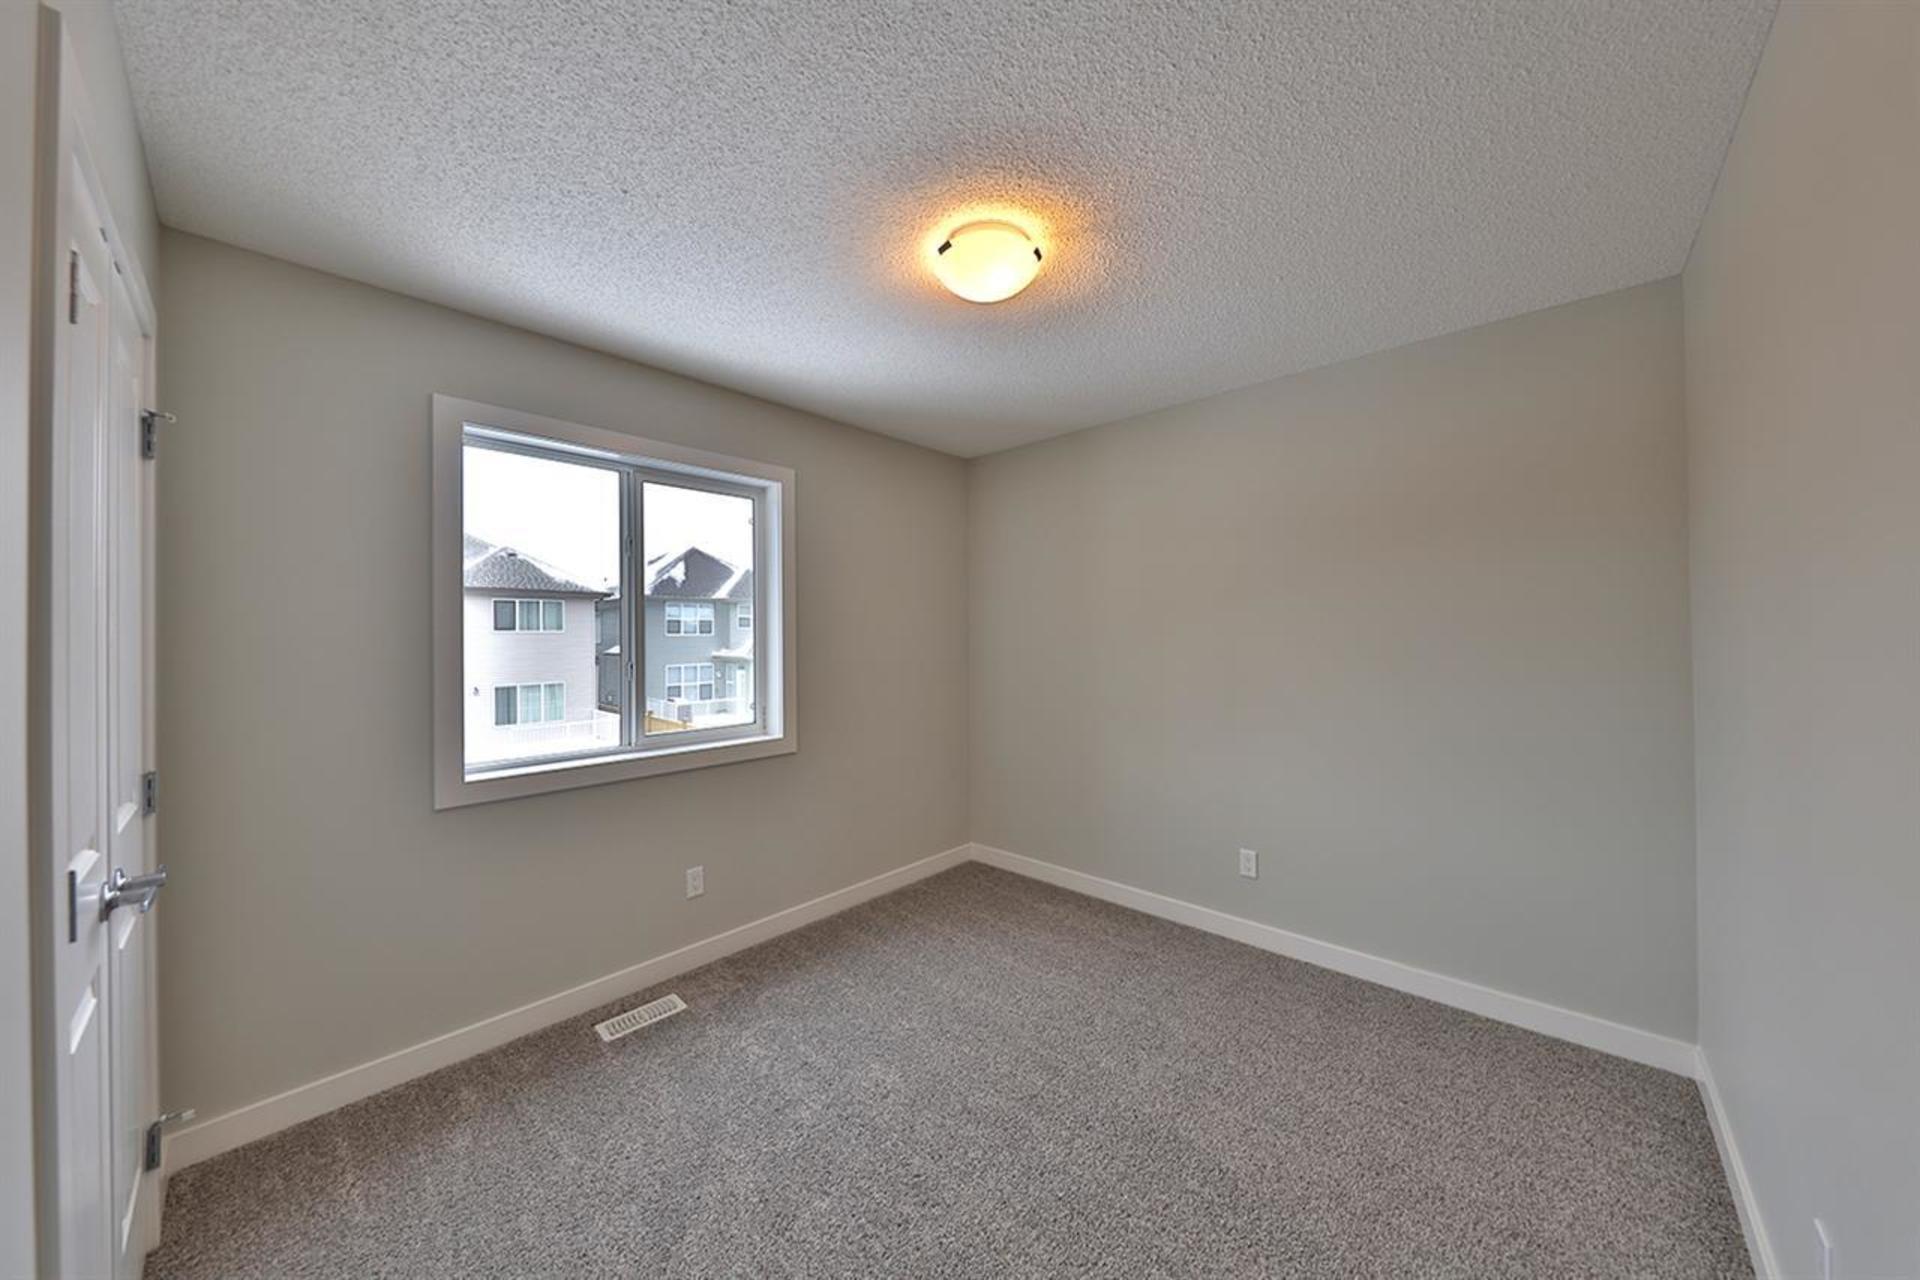 17550-60a-street-mcconachie-area-edmonton-18 at 17550 60a Street, McConachie Area, Edmonton